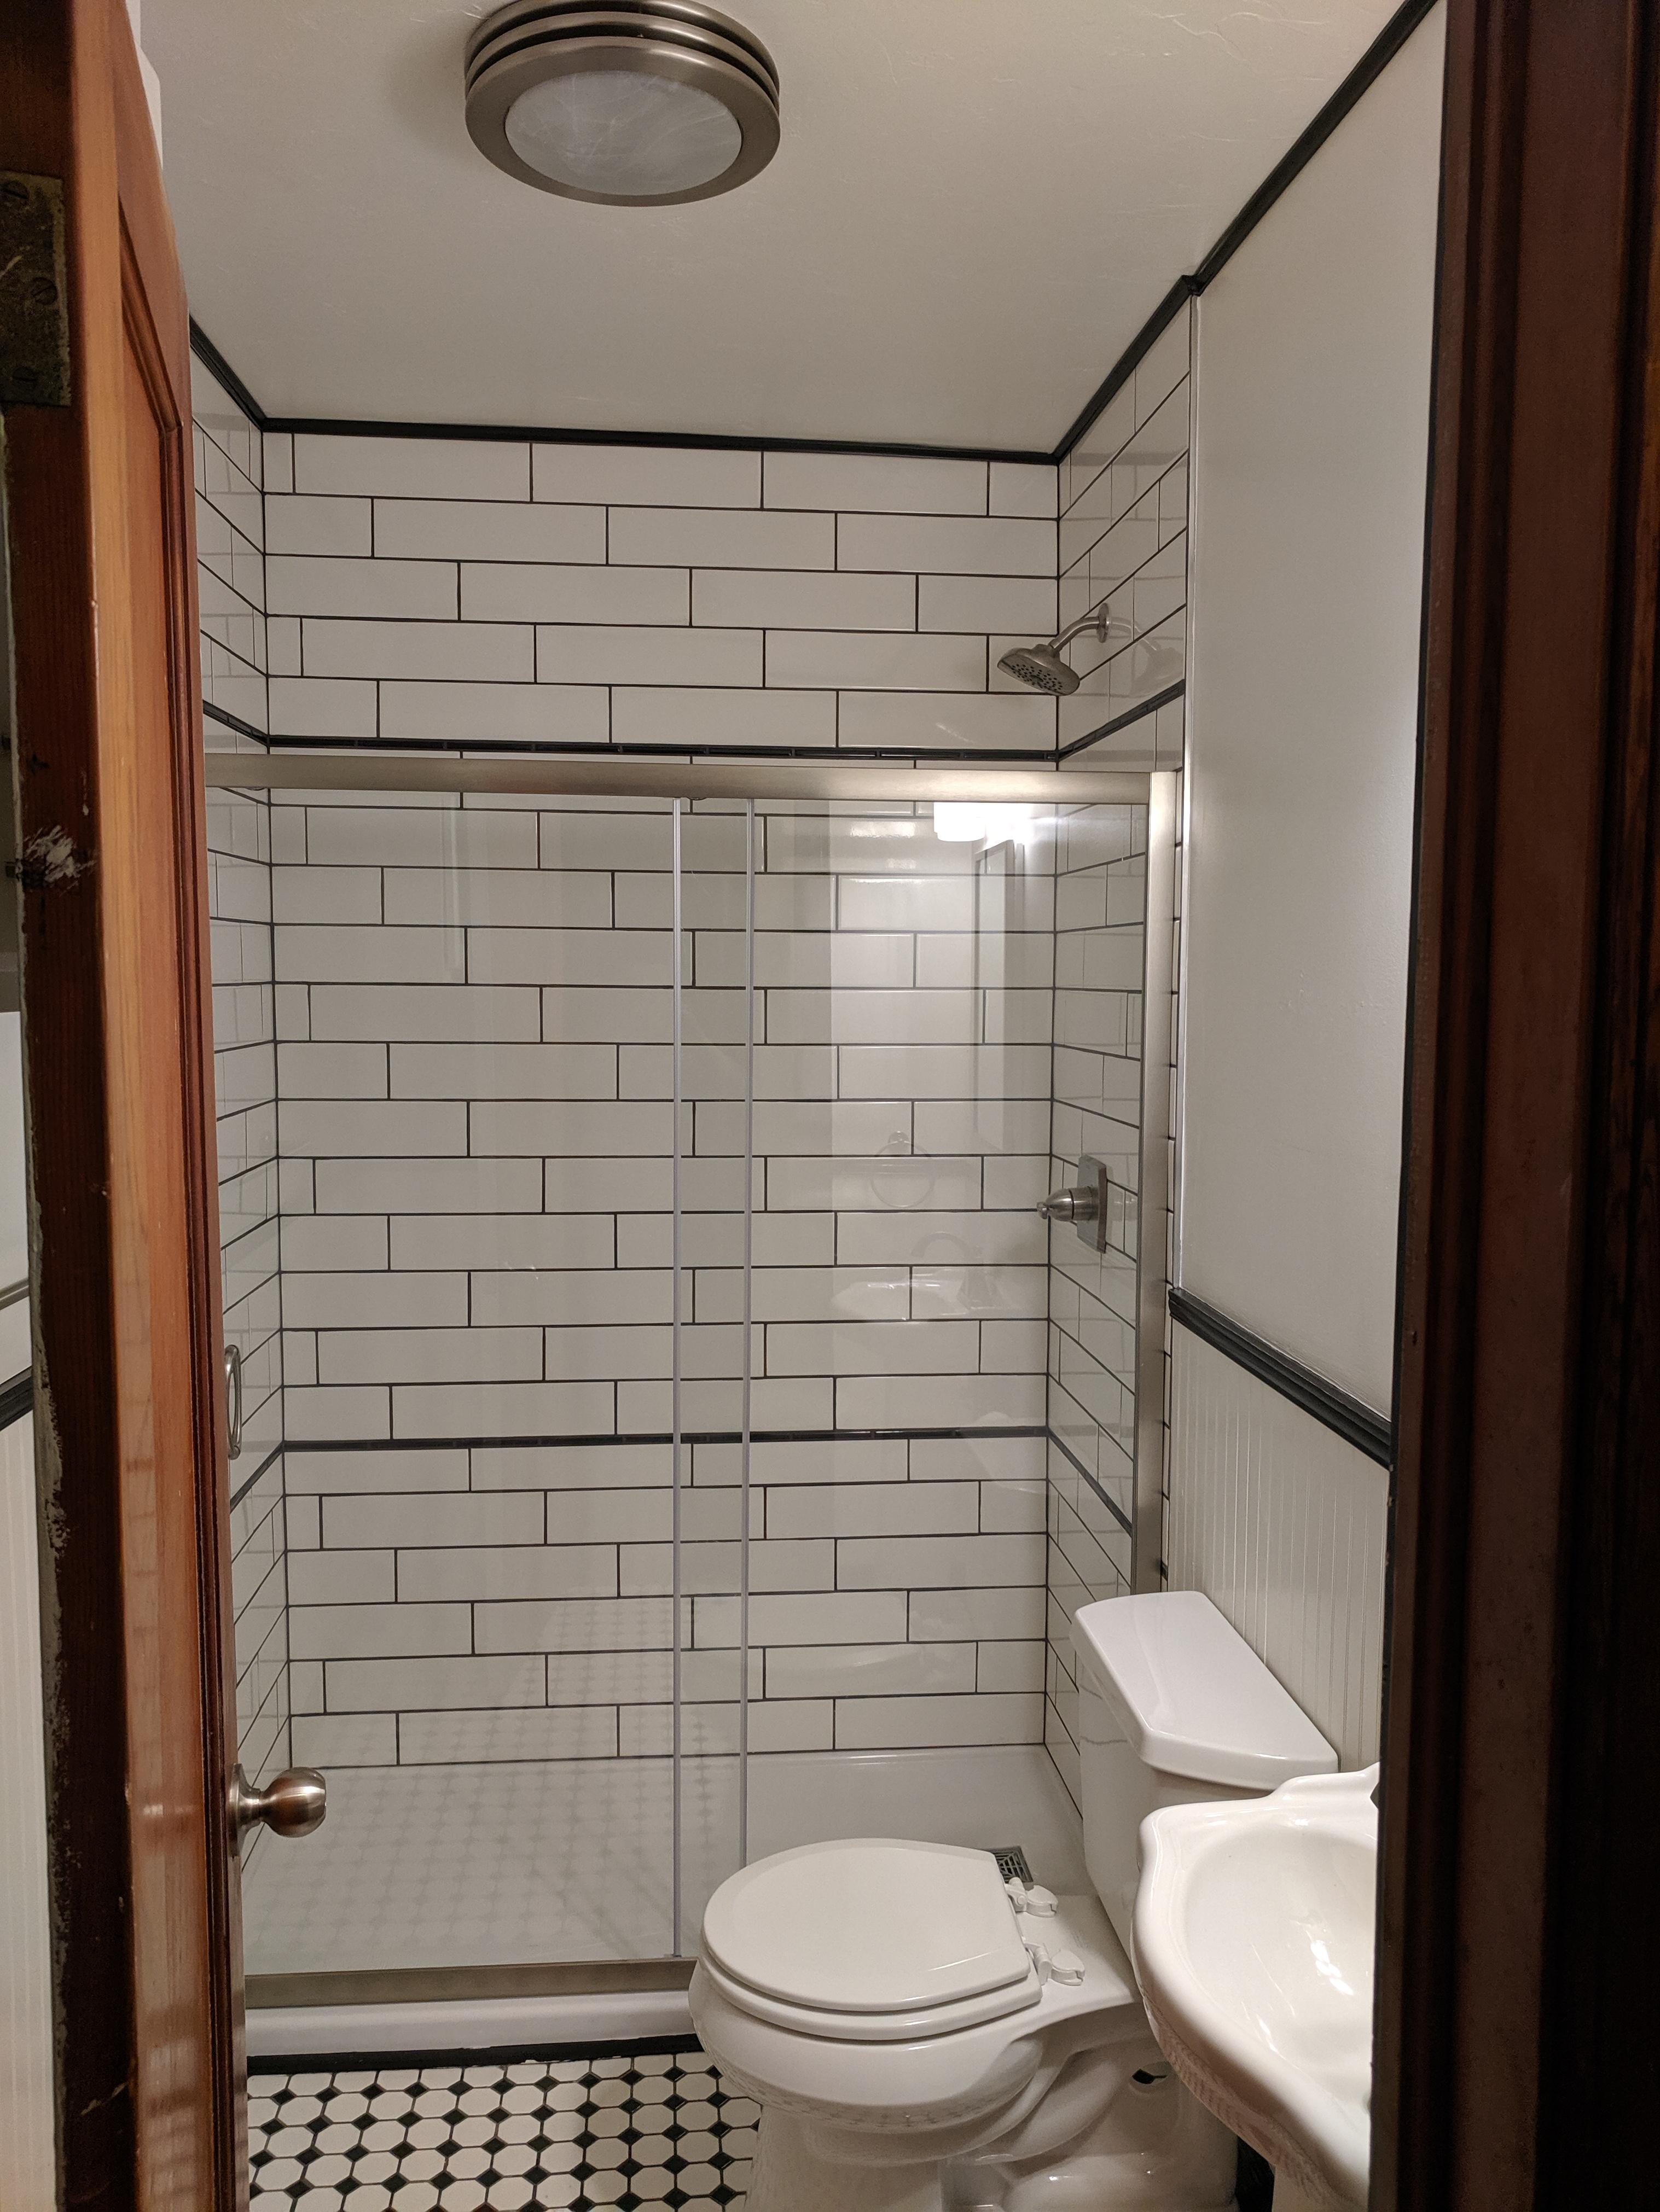 Downstairs Bathroom view looking at bathroom from door